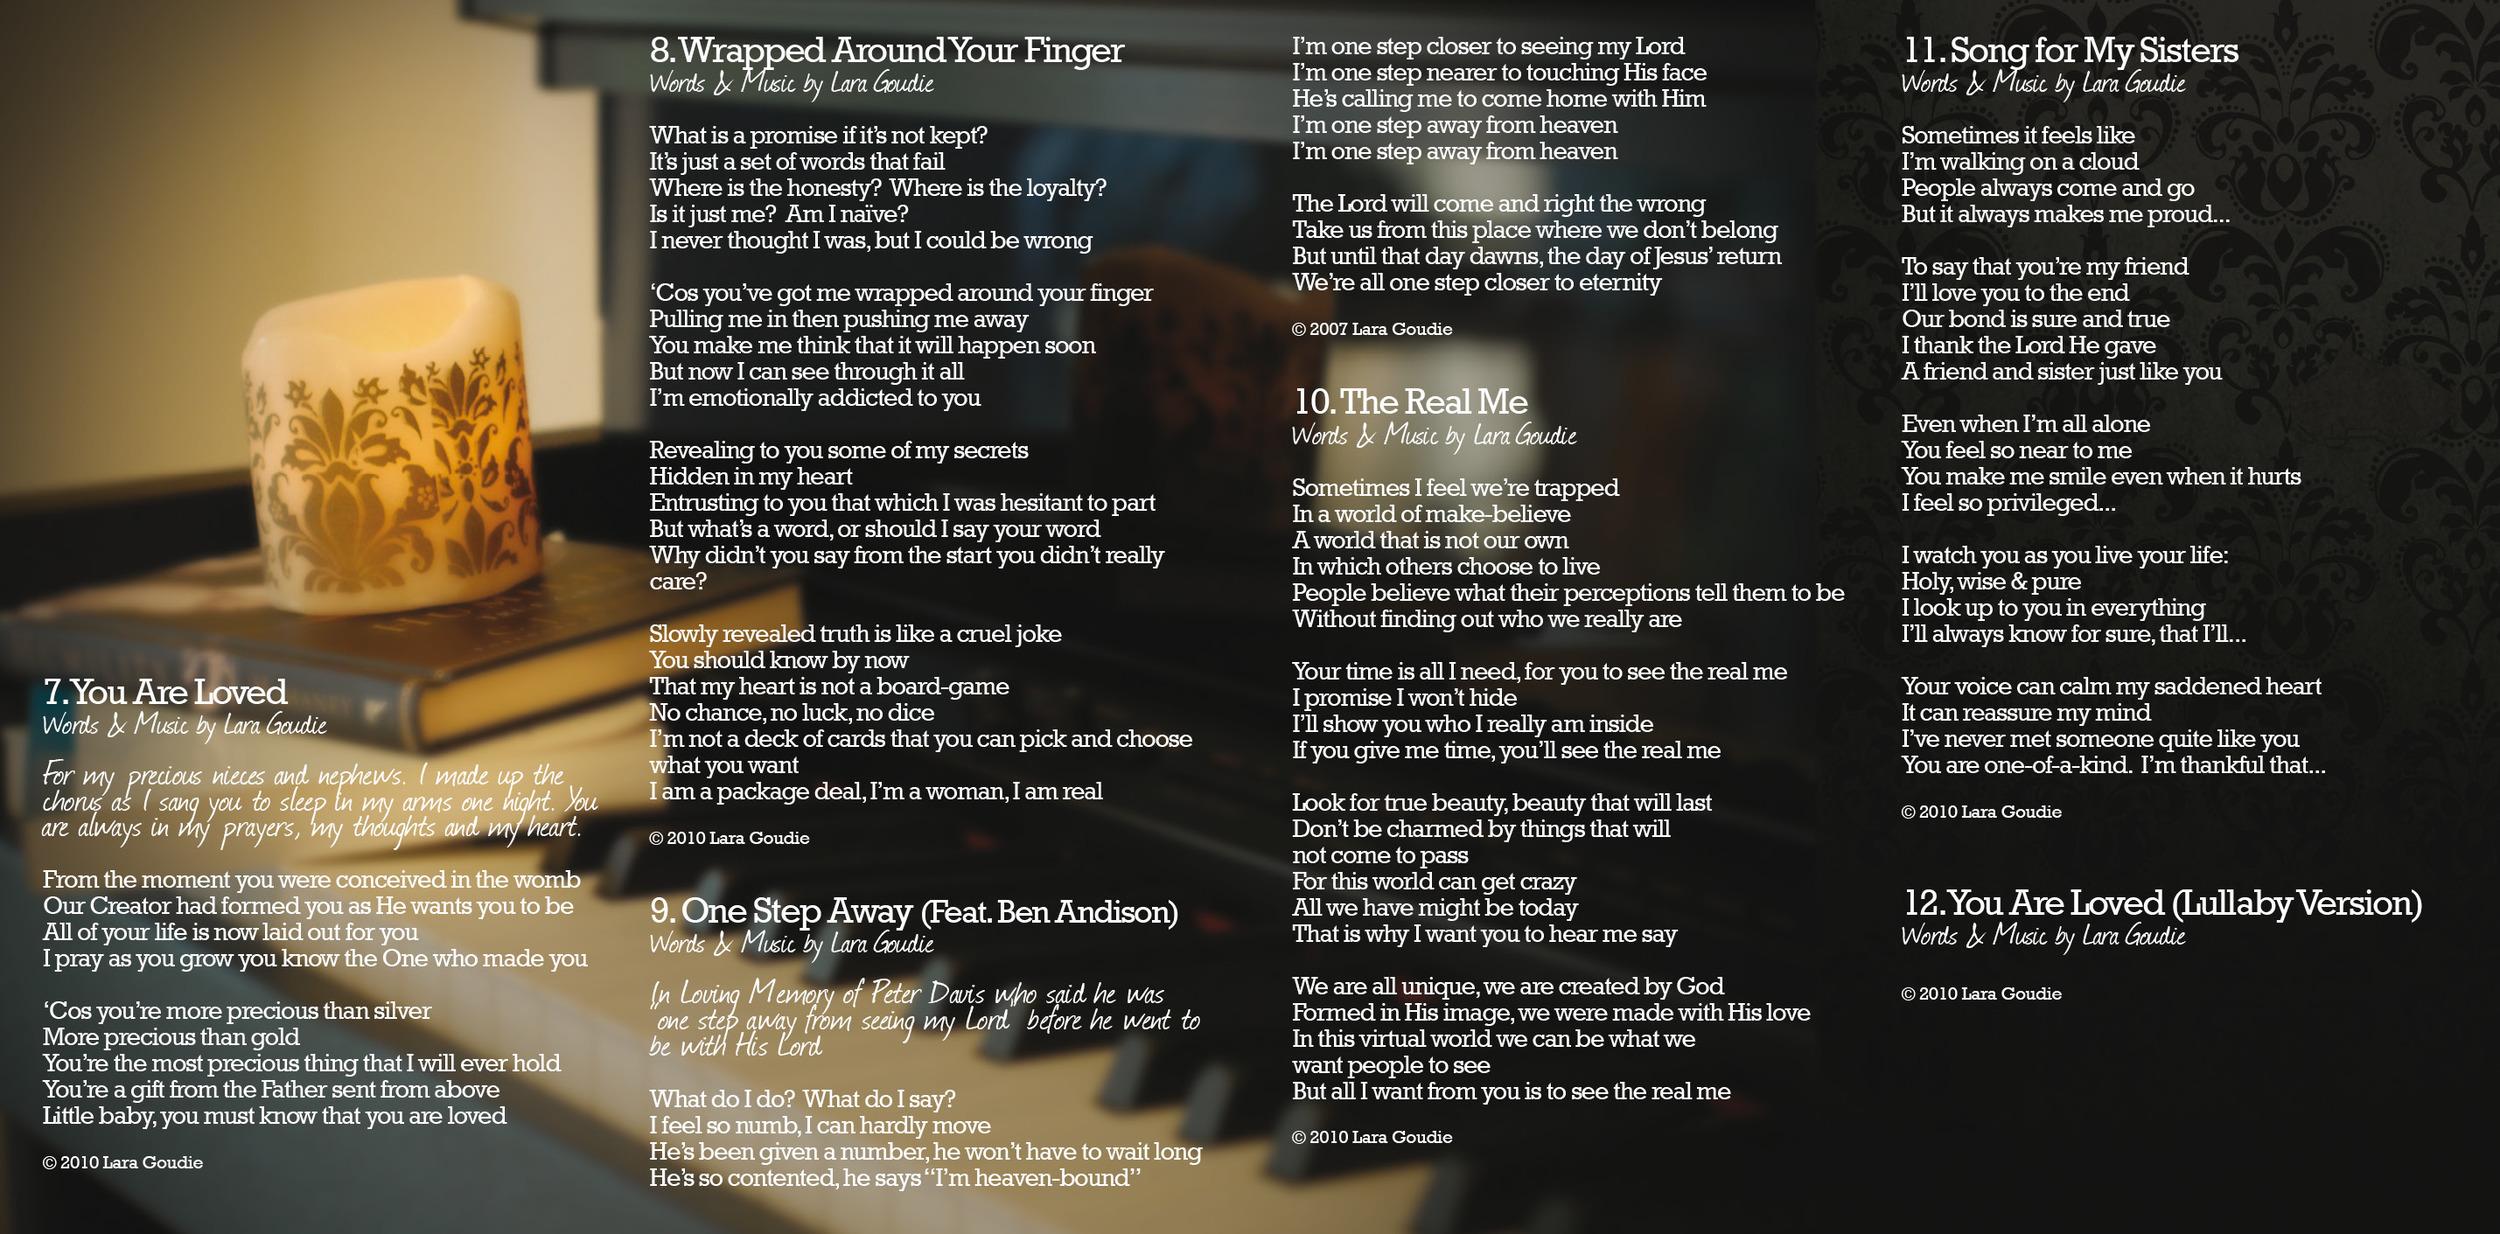 veechoy-LaraGoudieAlbum-04.jpg